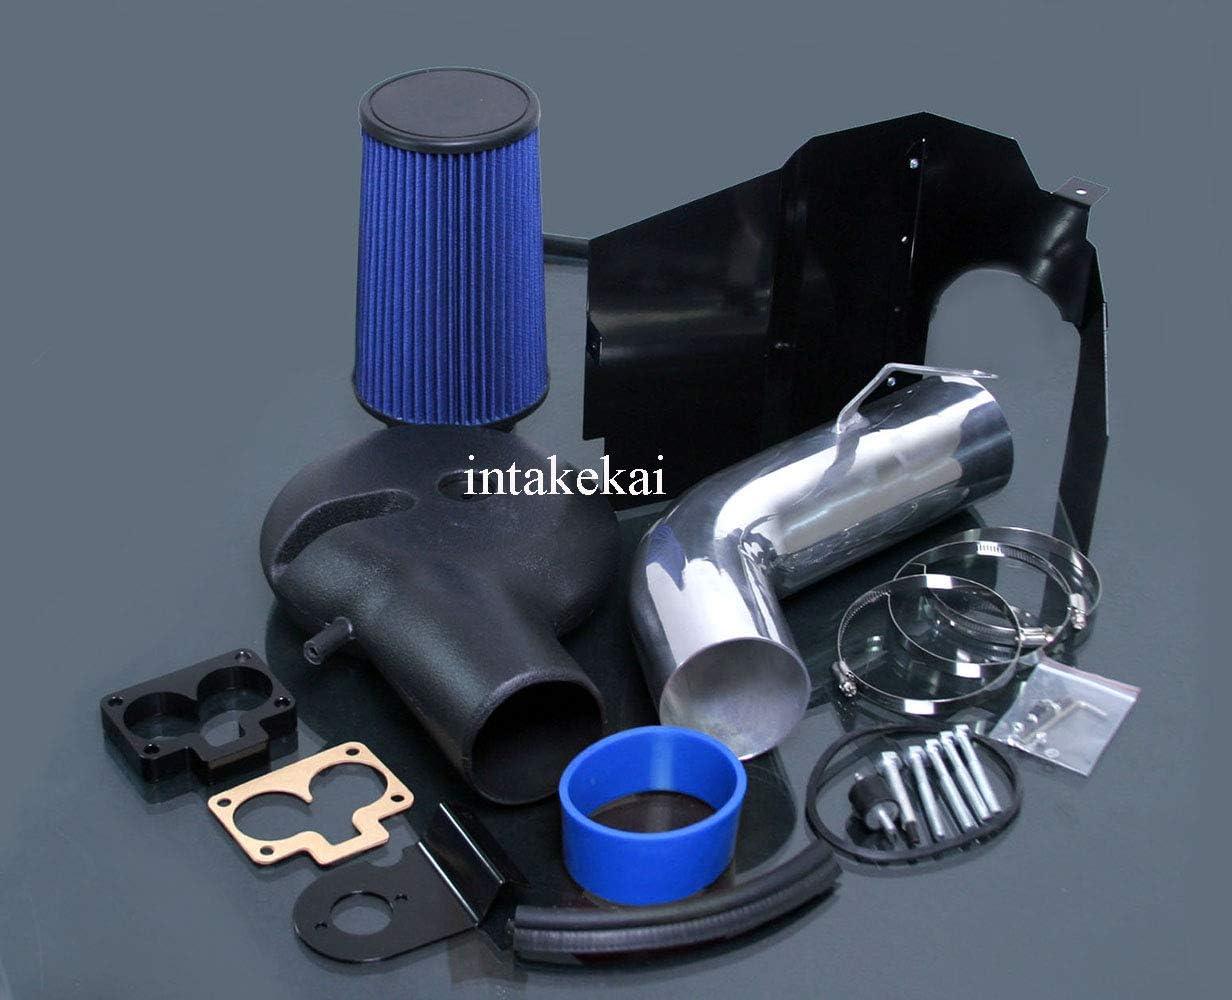 HEATSHIELD Cold AIR Intake KIT FIT 1997-1999 Dodge Dakota 1998-2003 Dodge Durango 5.2L RED 5.9L V8 Engine